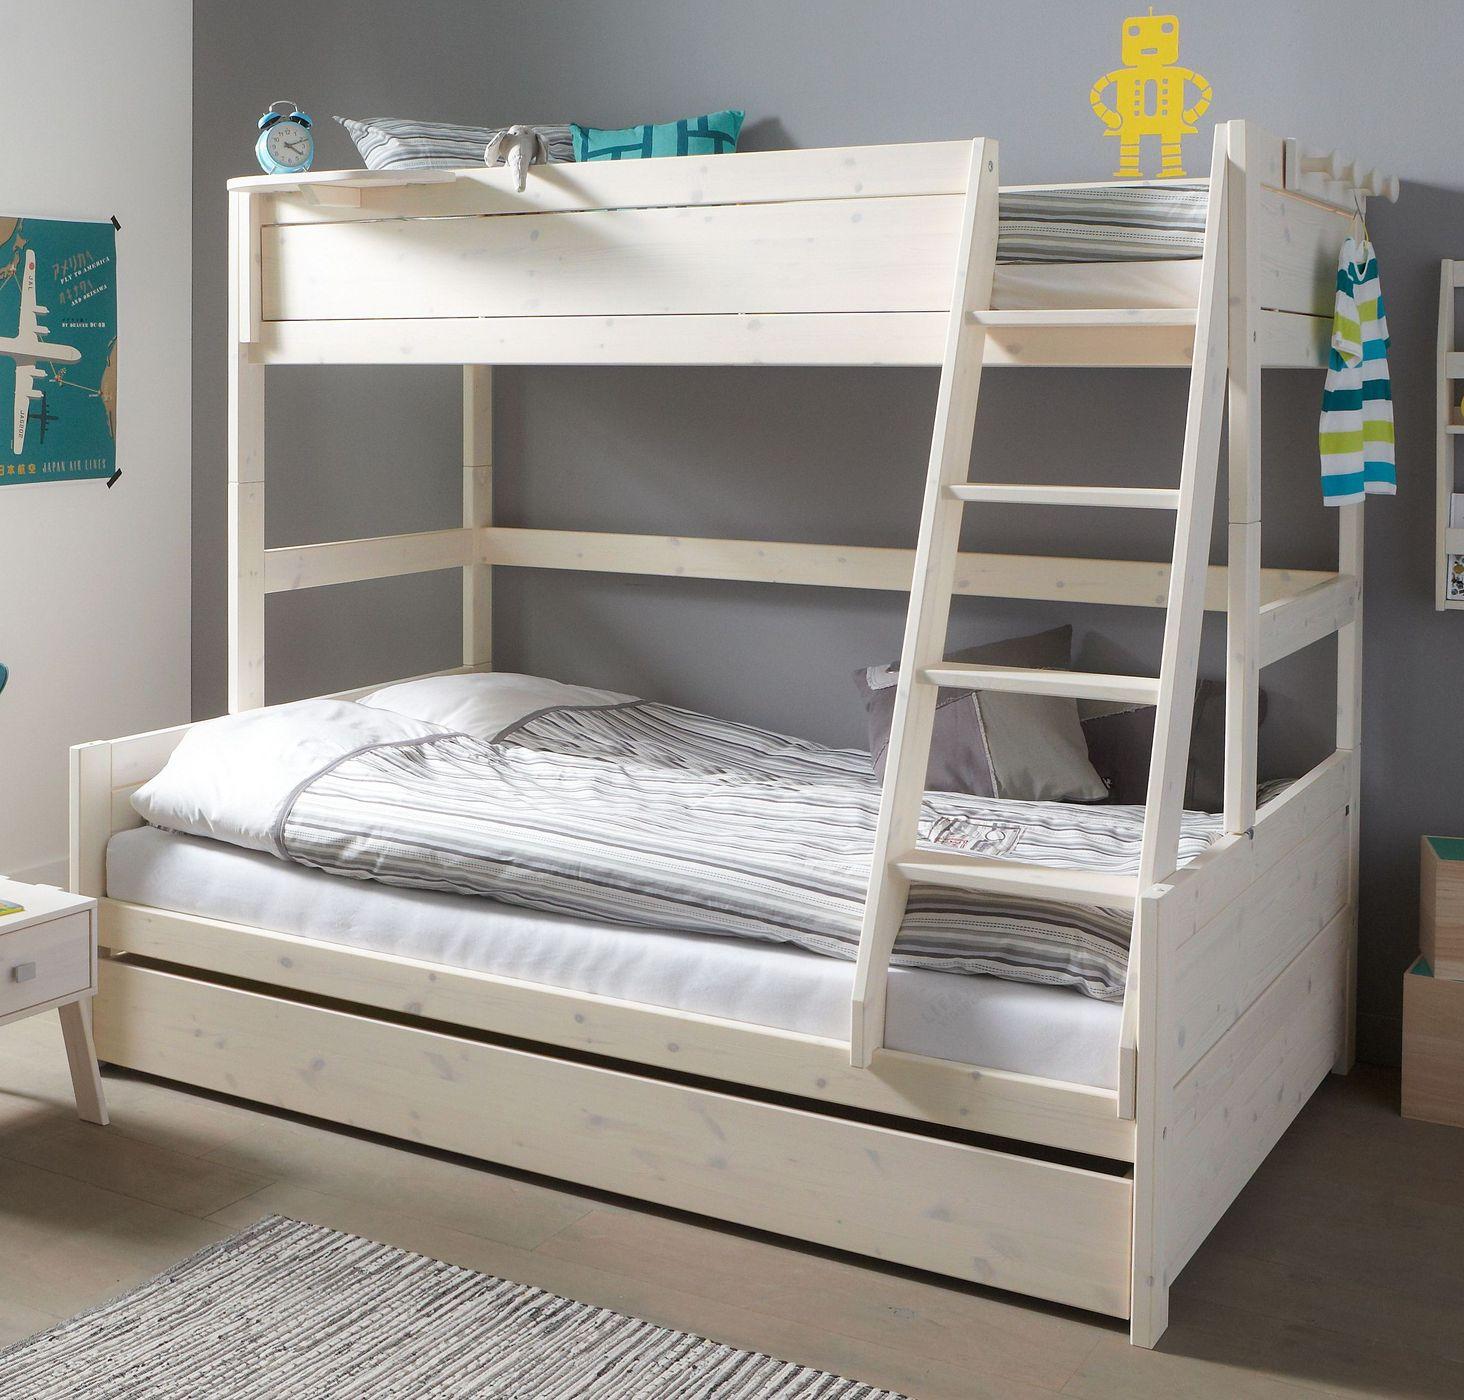 lifetime familienbett mit rausfallschutz in 2 gr en original. Black Bedroom Furniture Sets. Home Design Ideas